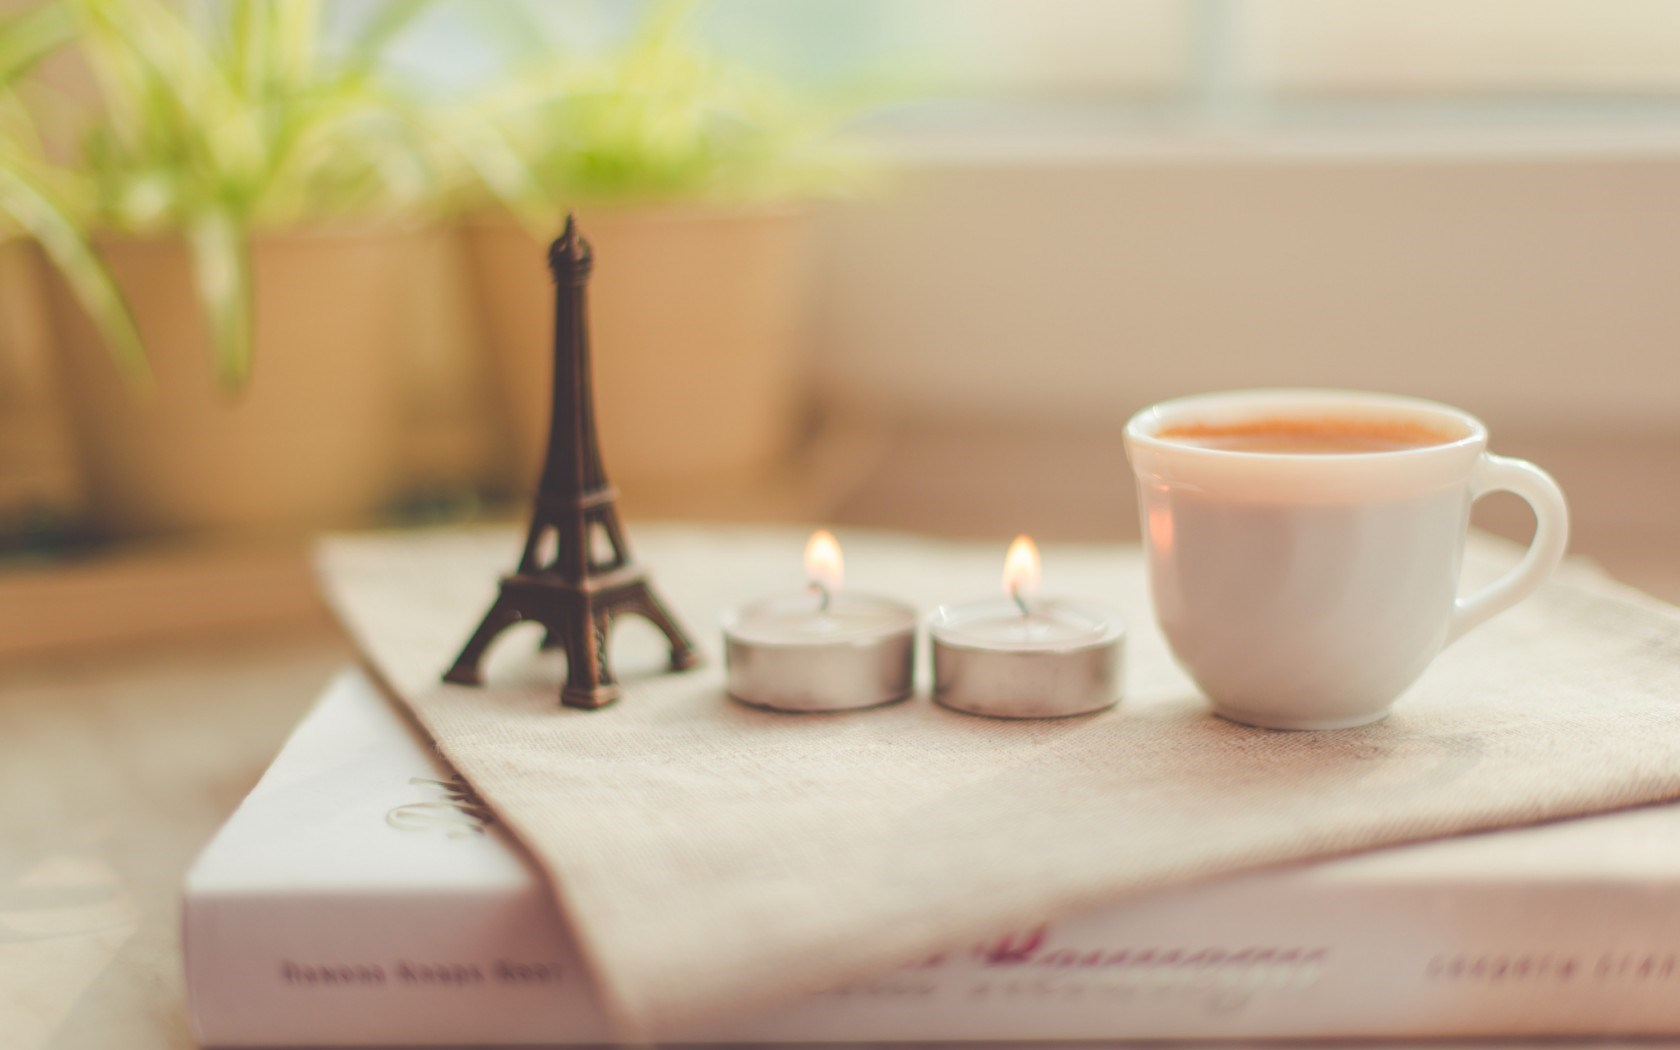 candles-eiffel-tower-coffee-cup-book-photo-vintage-hd-wallpaper.jpg